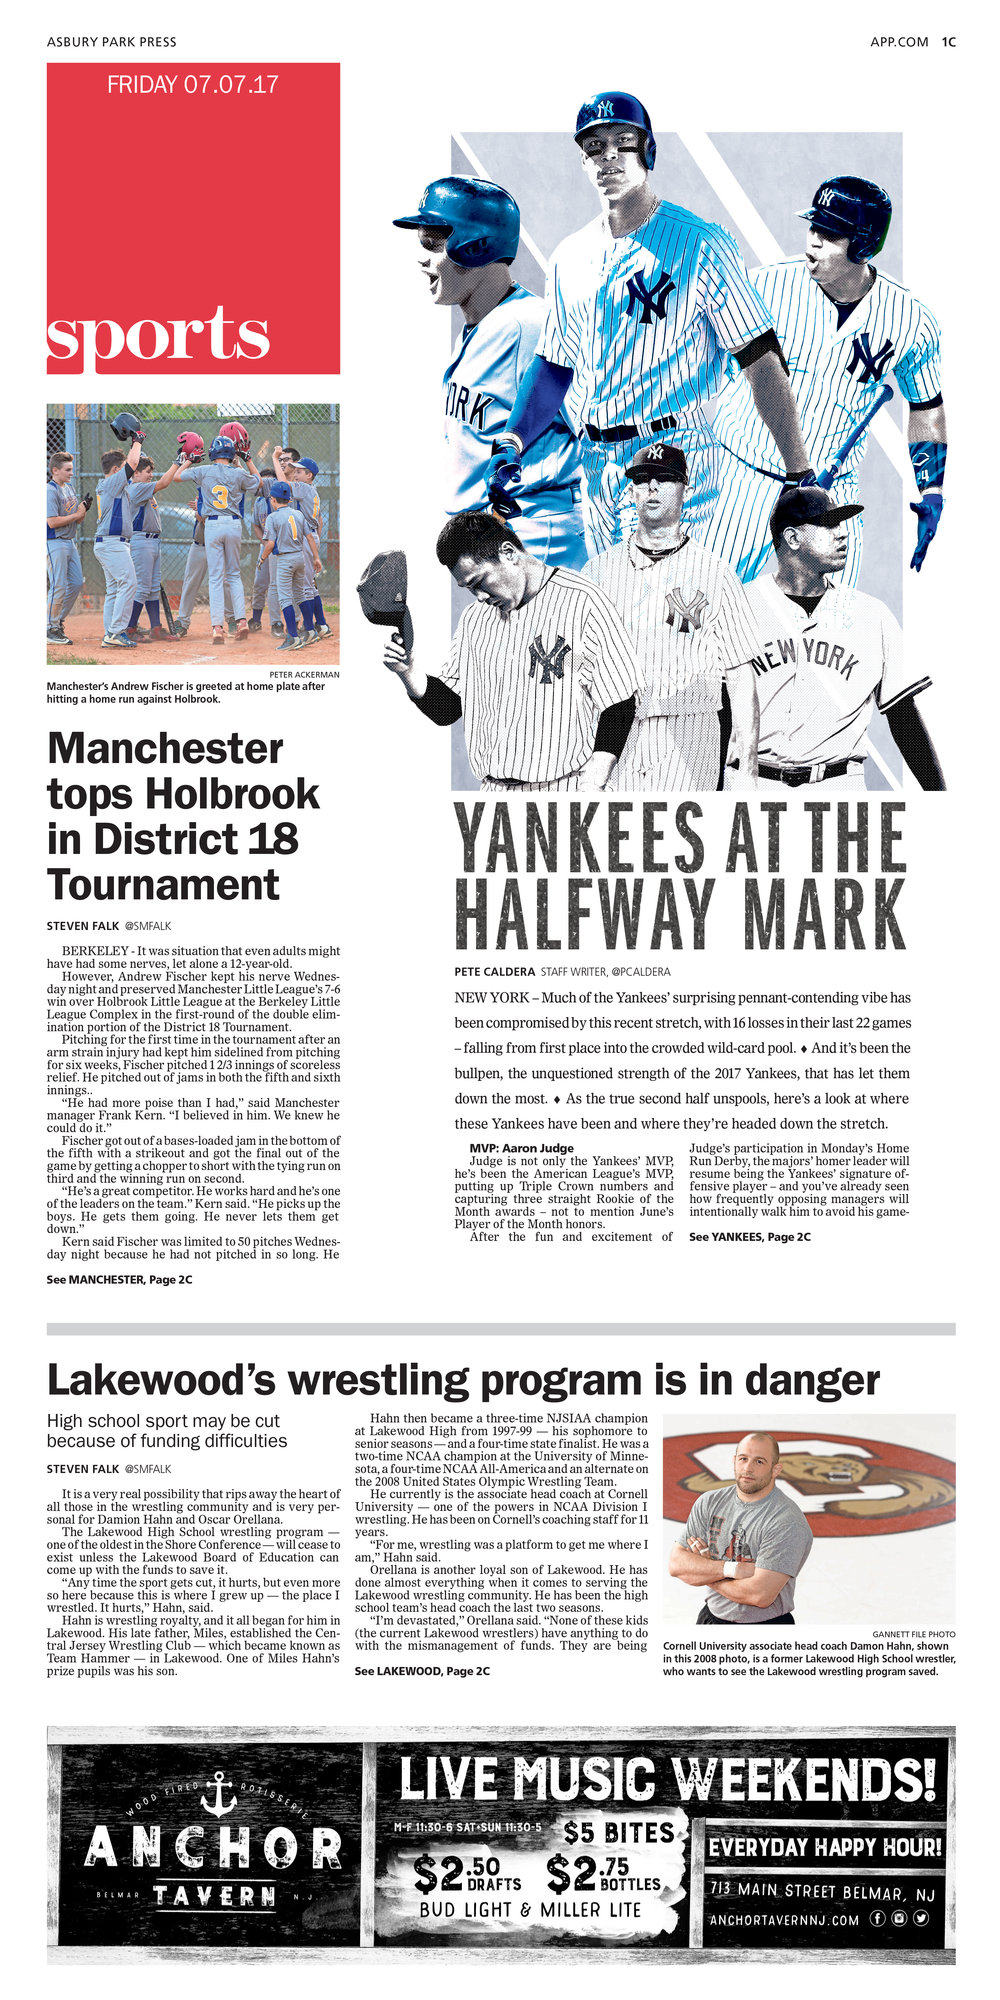 Sports-Cov, ASBBrd 07-07-2017, PressMon 1 - Sports.jpg